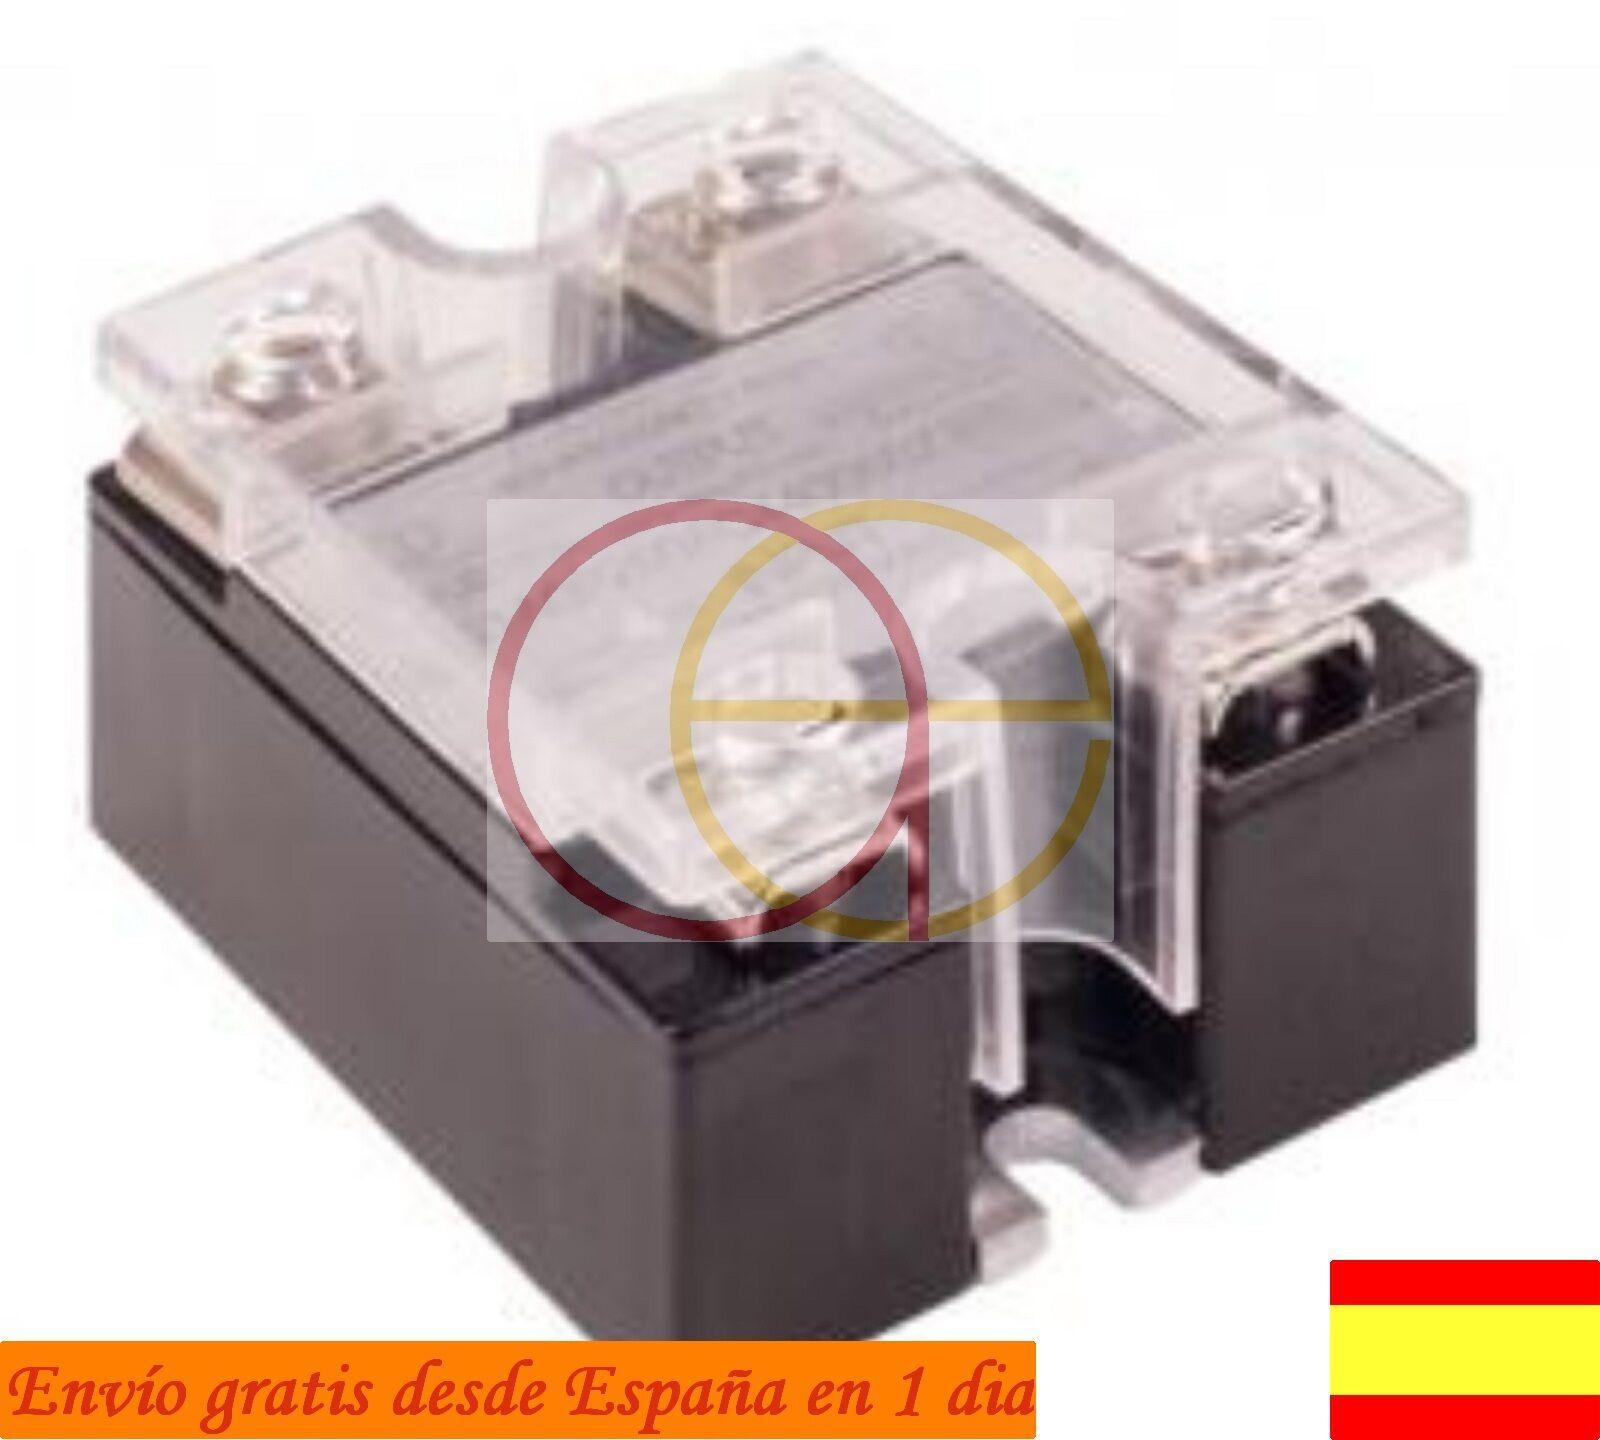 RELE  RELAY REGULADOR SOLIDO SSR 100 A Farnell Omron Arduino RS1API420MA380100R